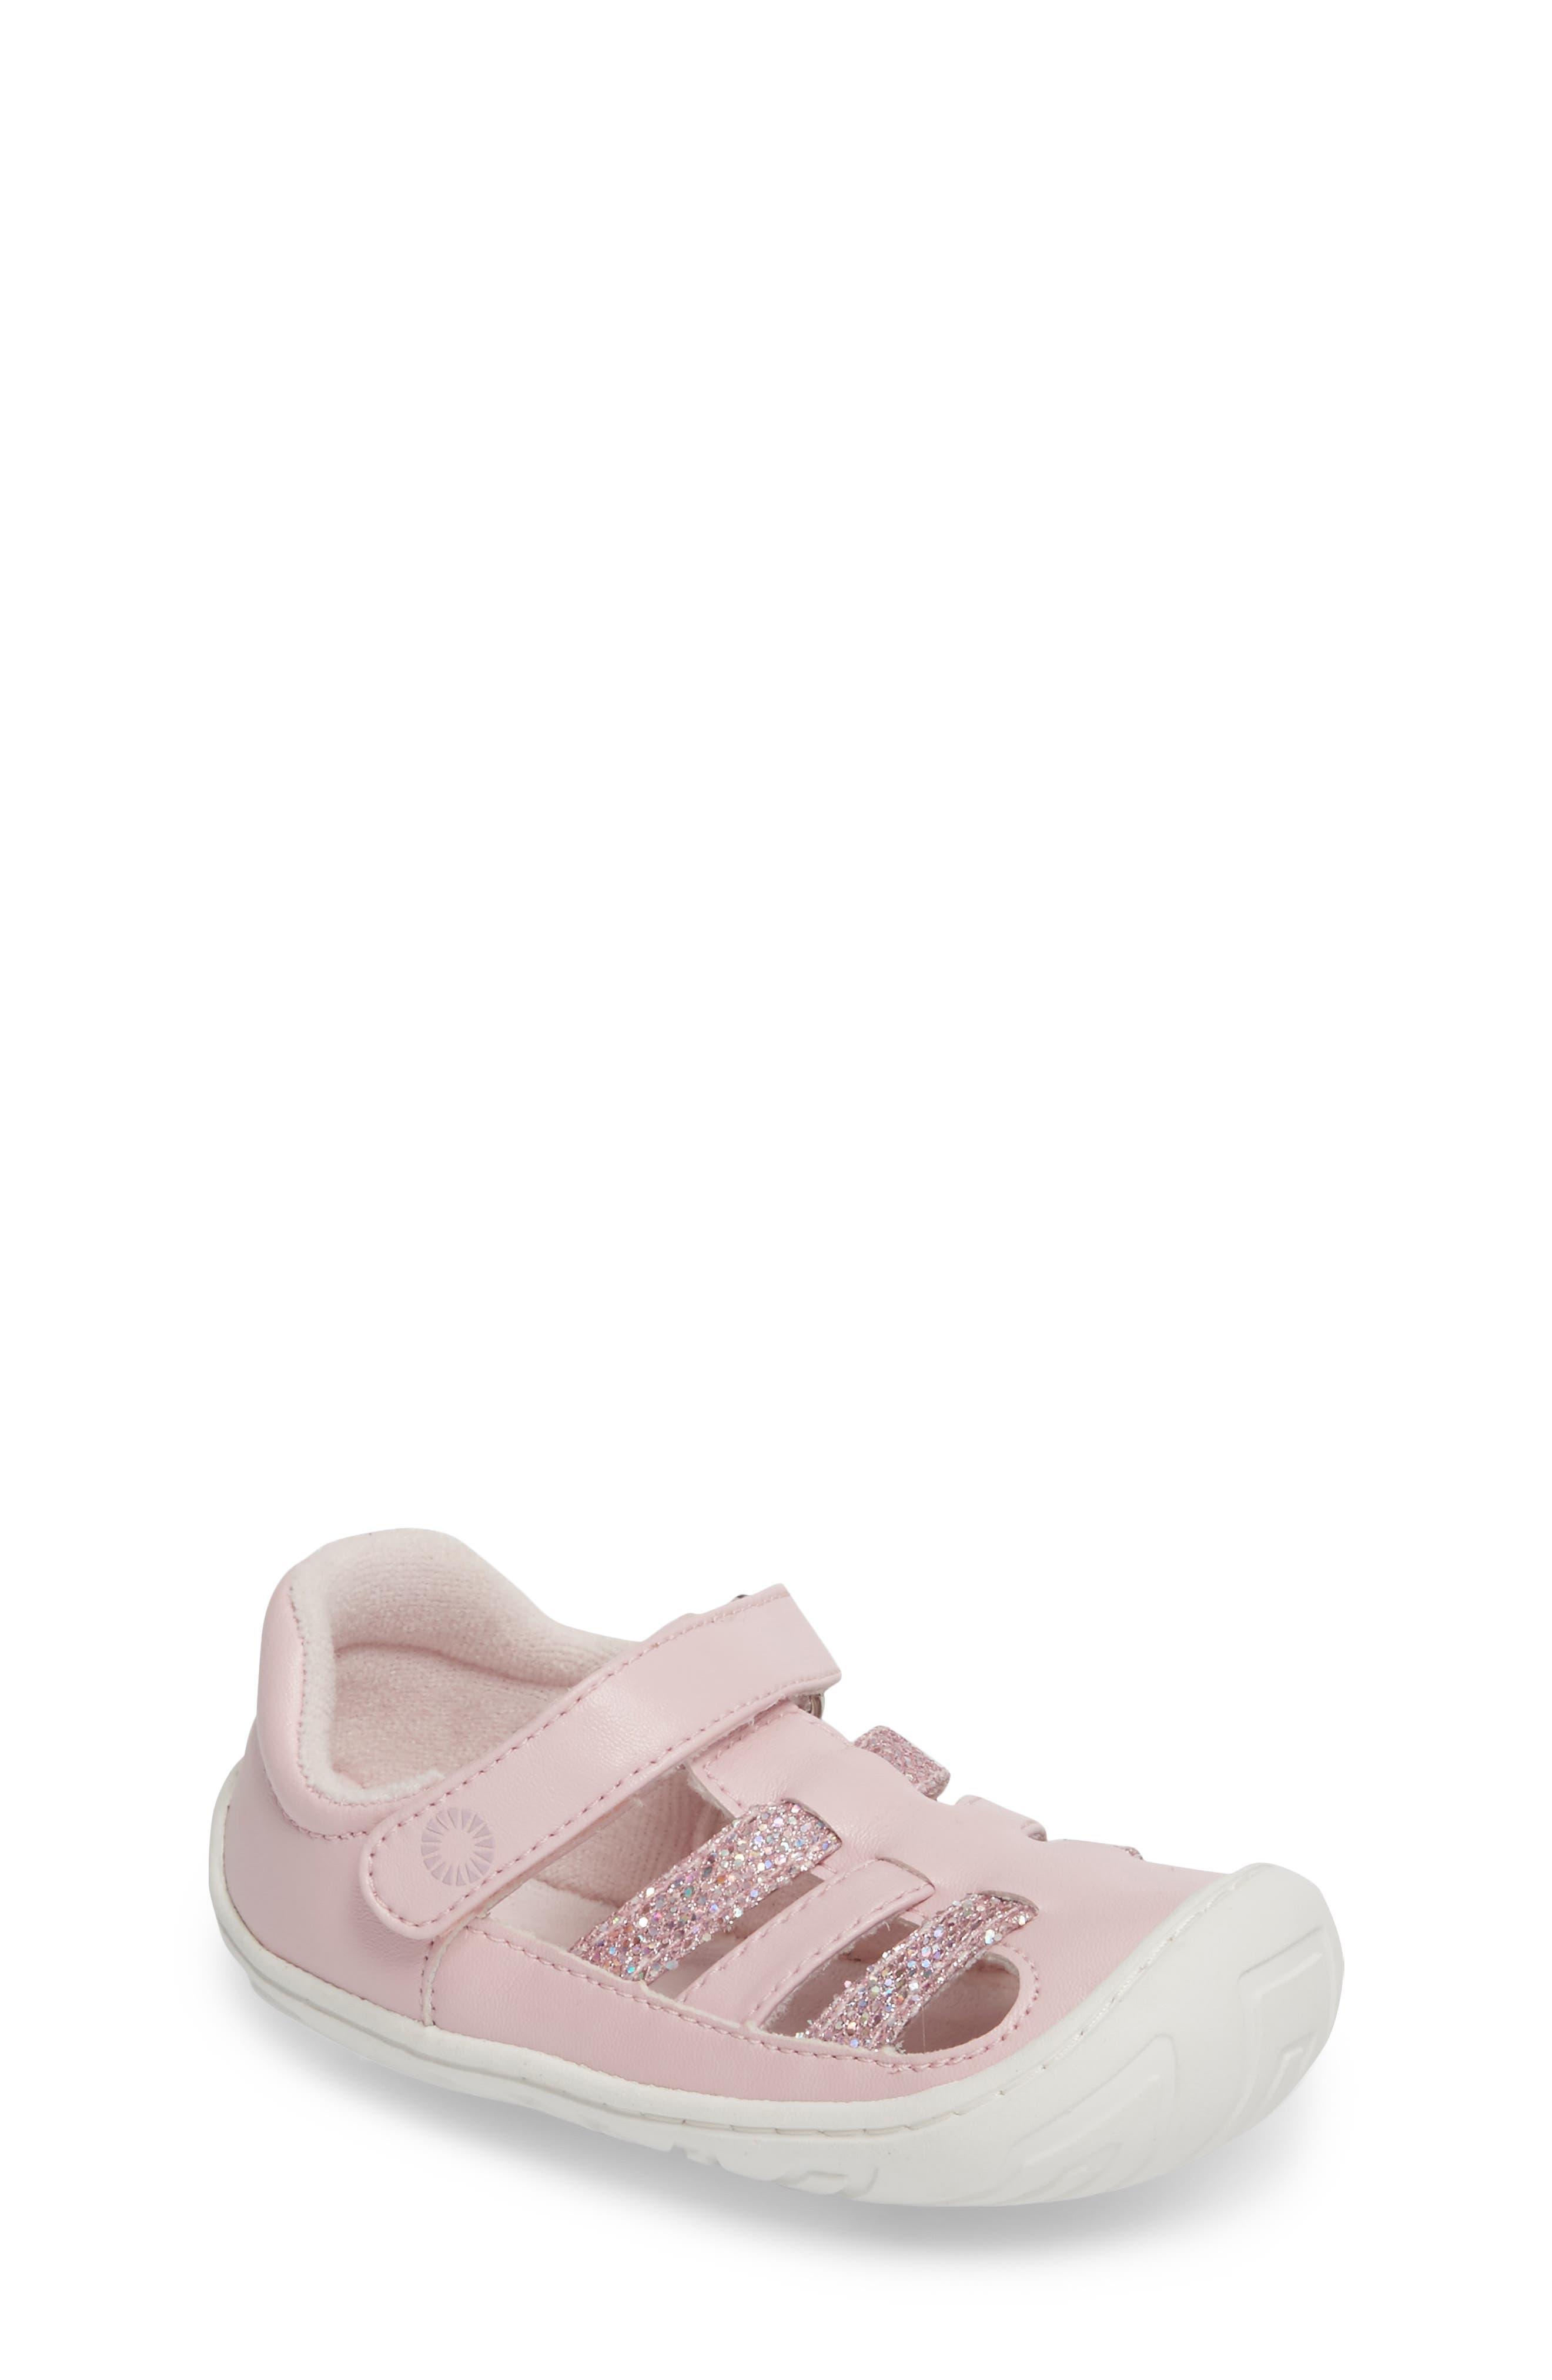 Santore Glitter Sandal,                             Main thumbnail 1, color,                             Seashell Pink